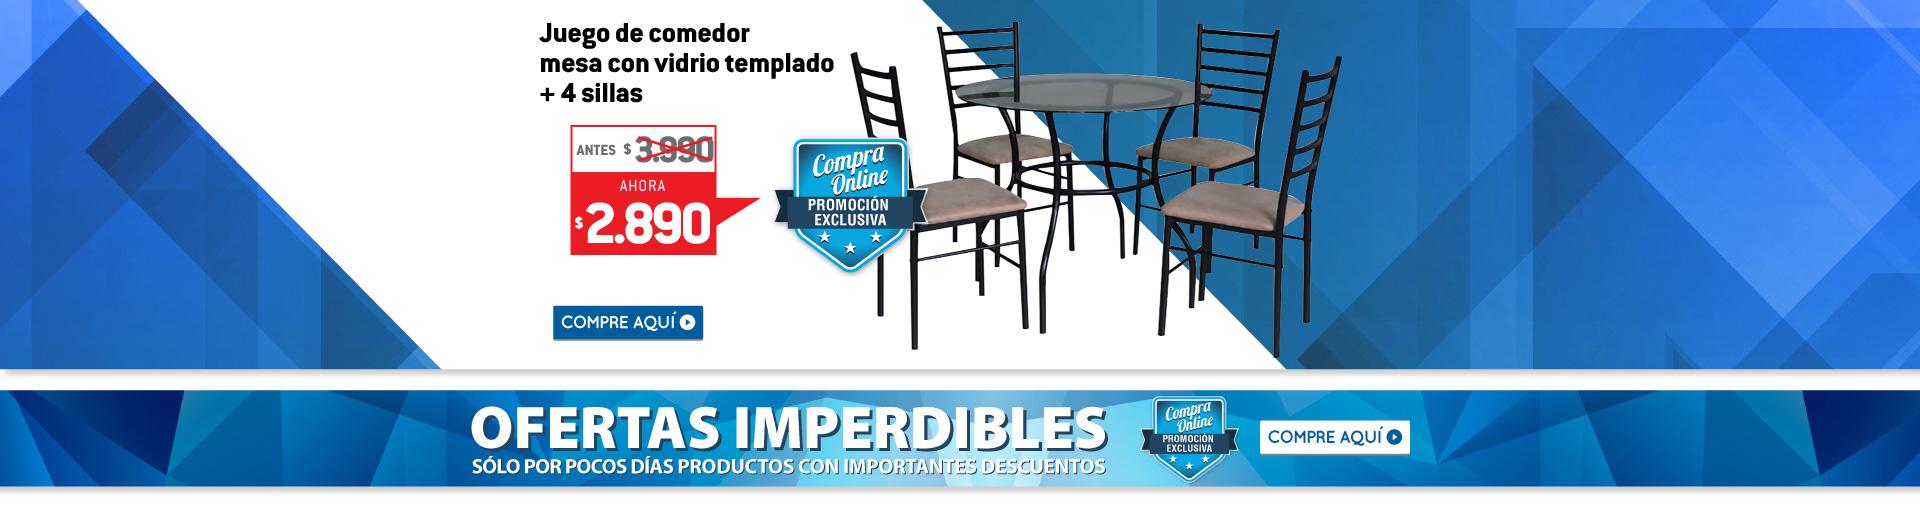 h-Ofertas Imperdibles - Muebles